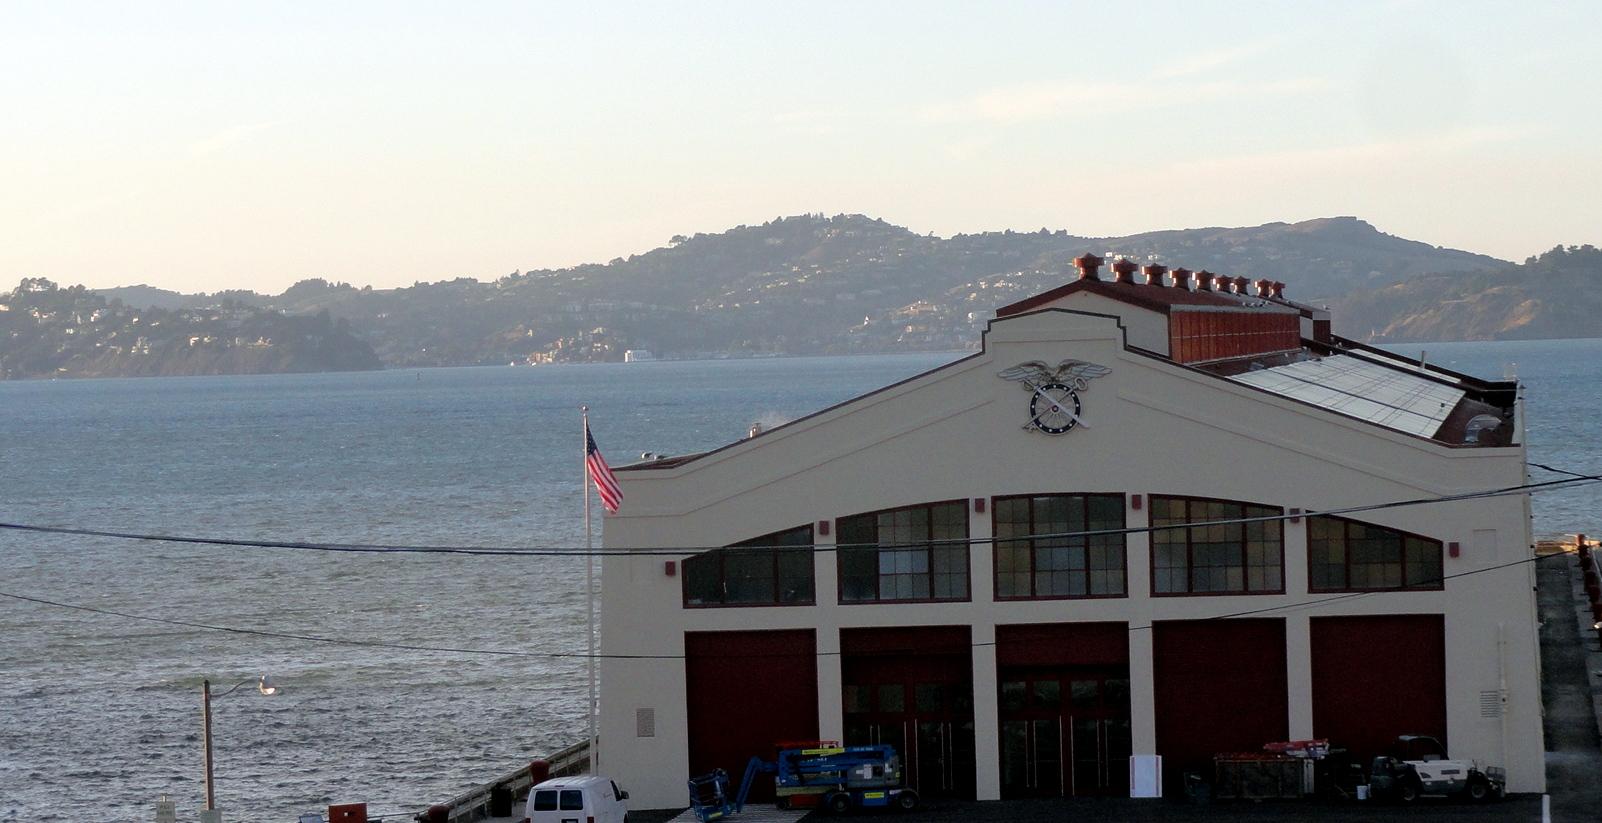 Fort Mason & the Bay